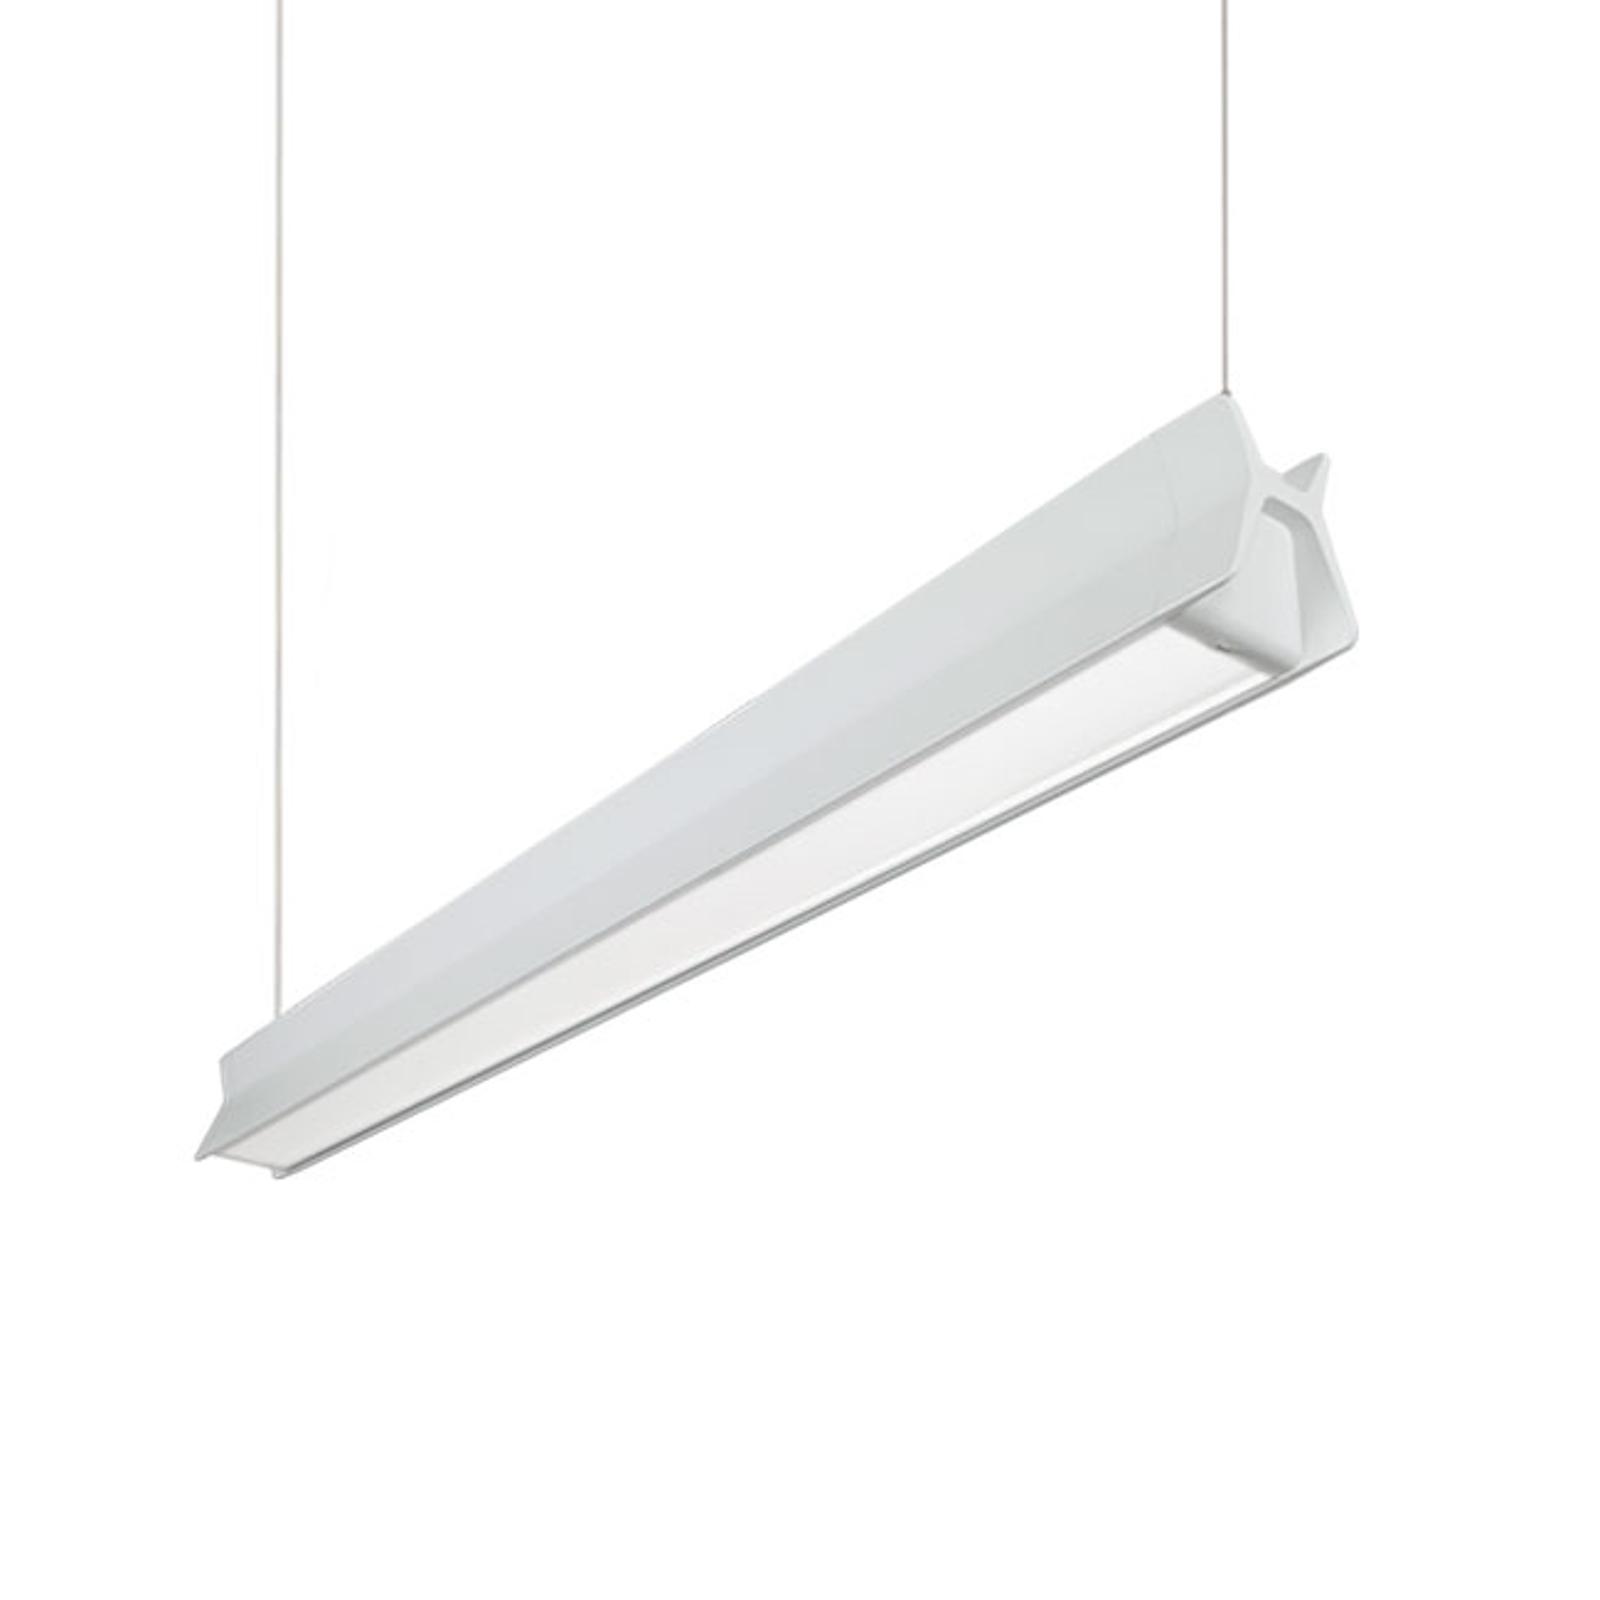 LED hanglamp C56-P1200, 50/50, wit, 126,3 cm